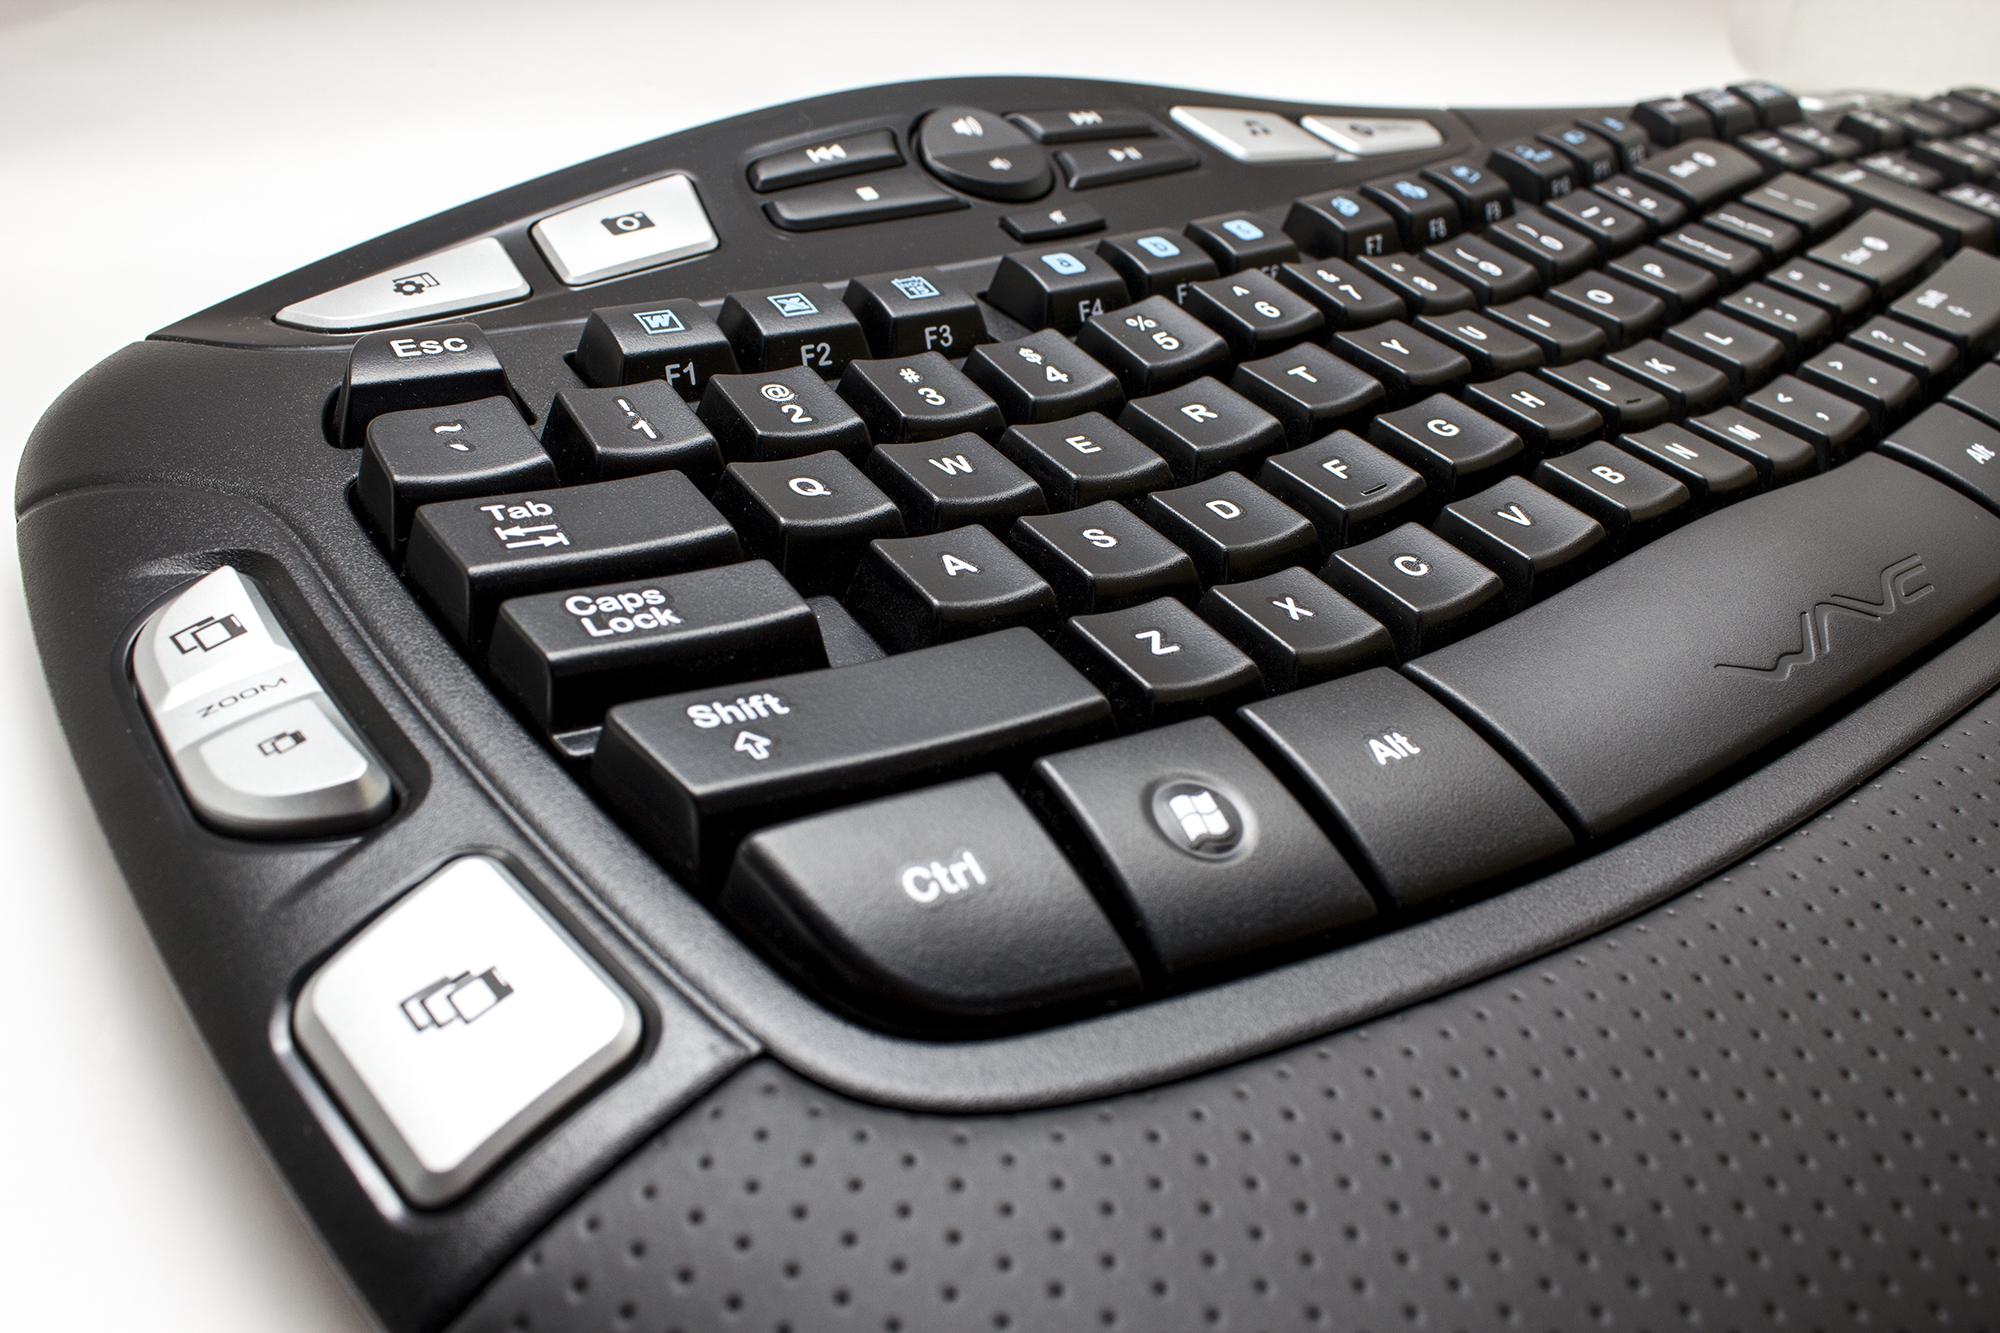 Logitech K350 Keyboard and Mouse Set 3   iSeaClear, Inc